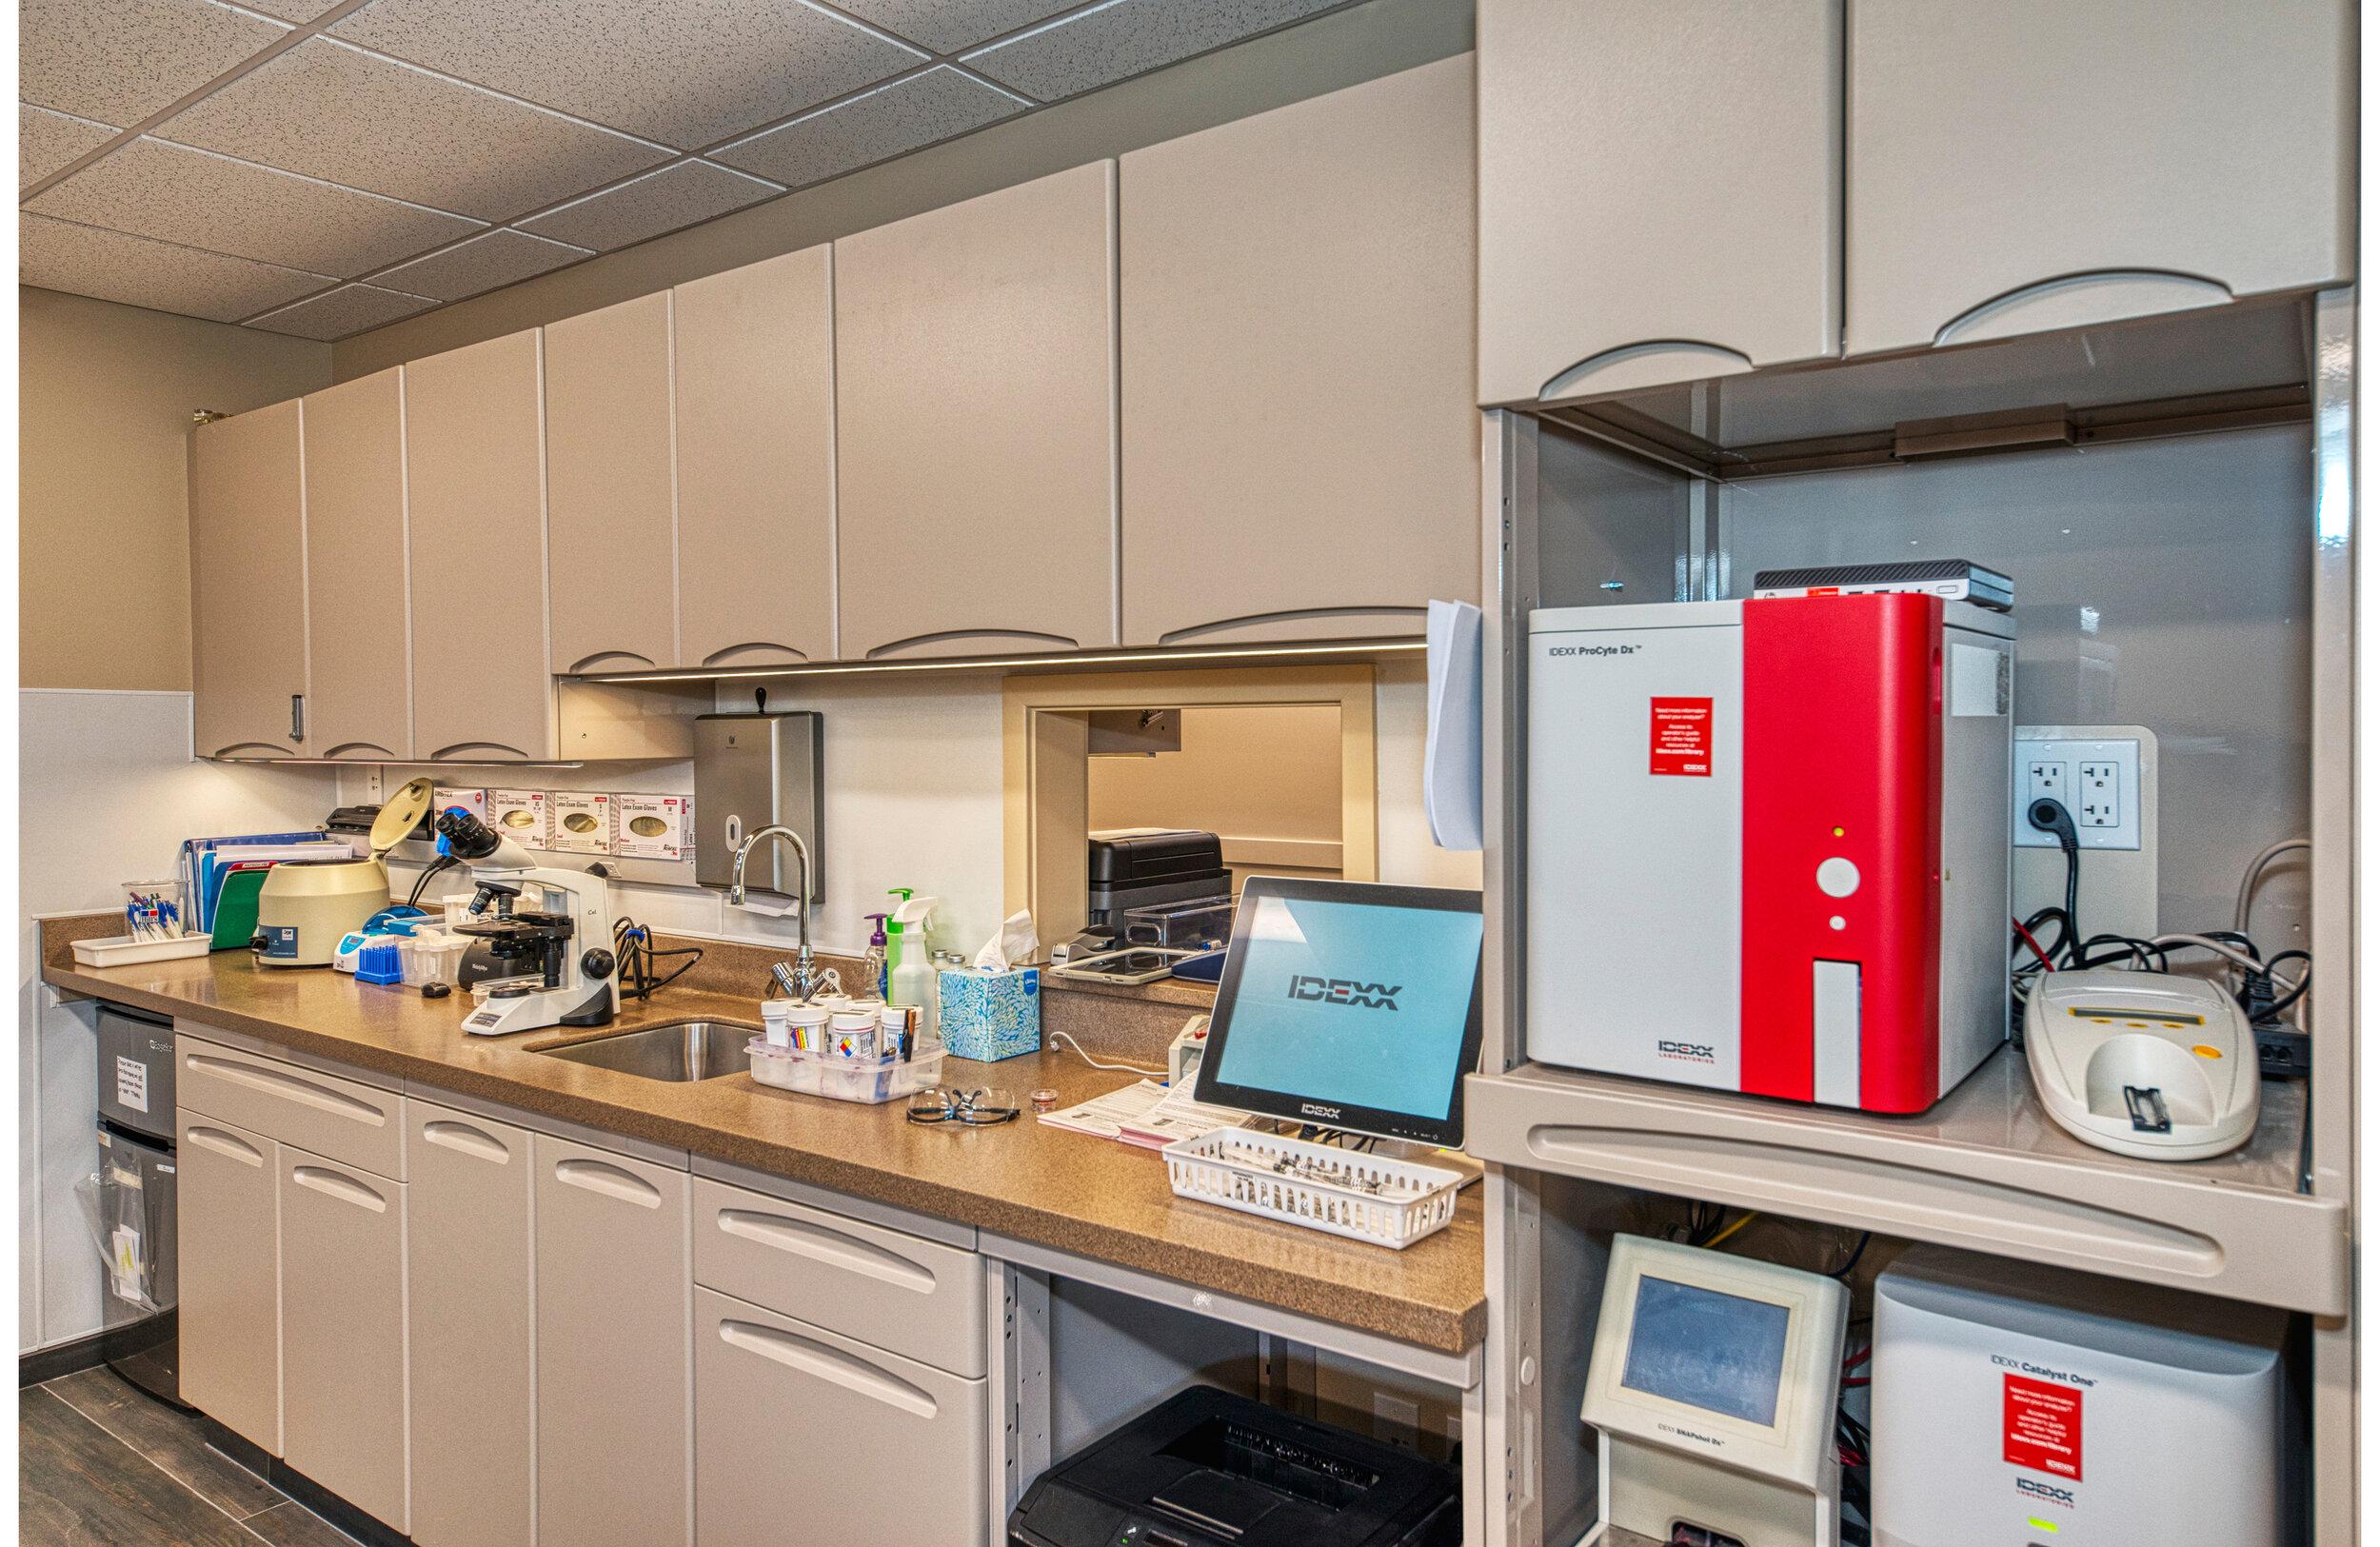 GilbertsvilleVeterinaryHospital_Laboratory.jpg